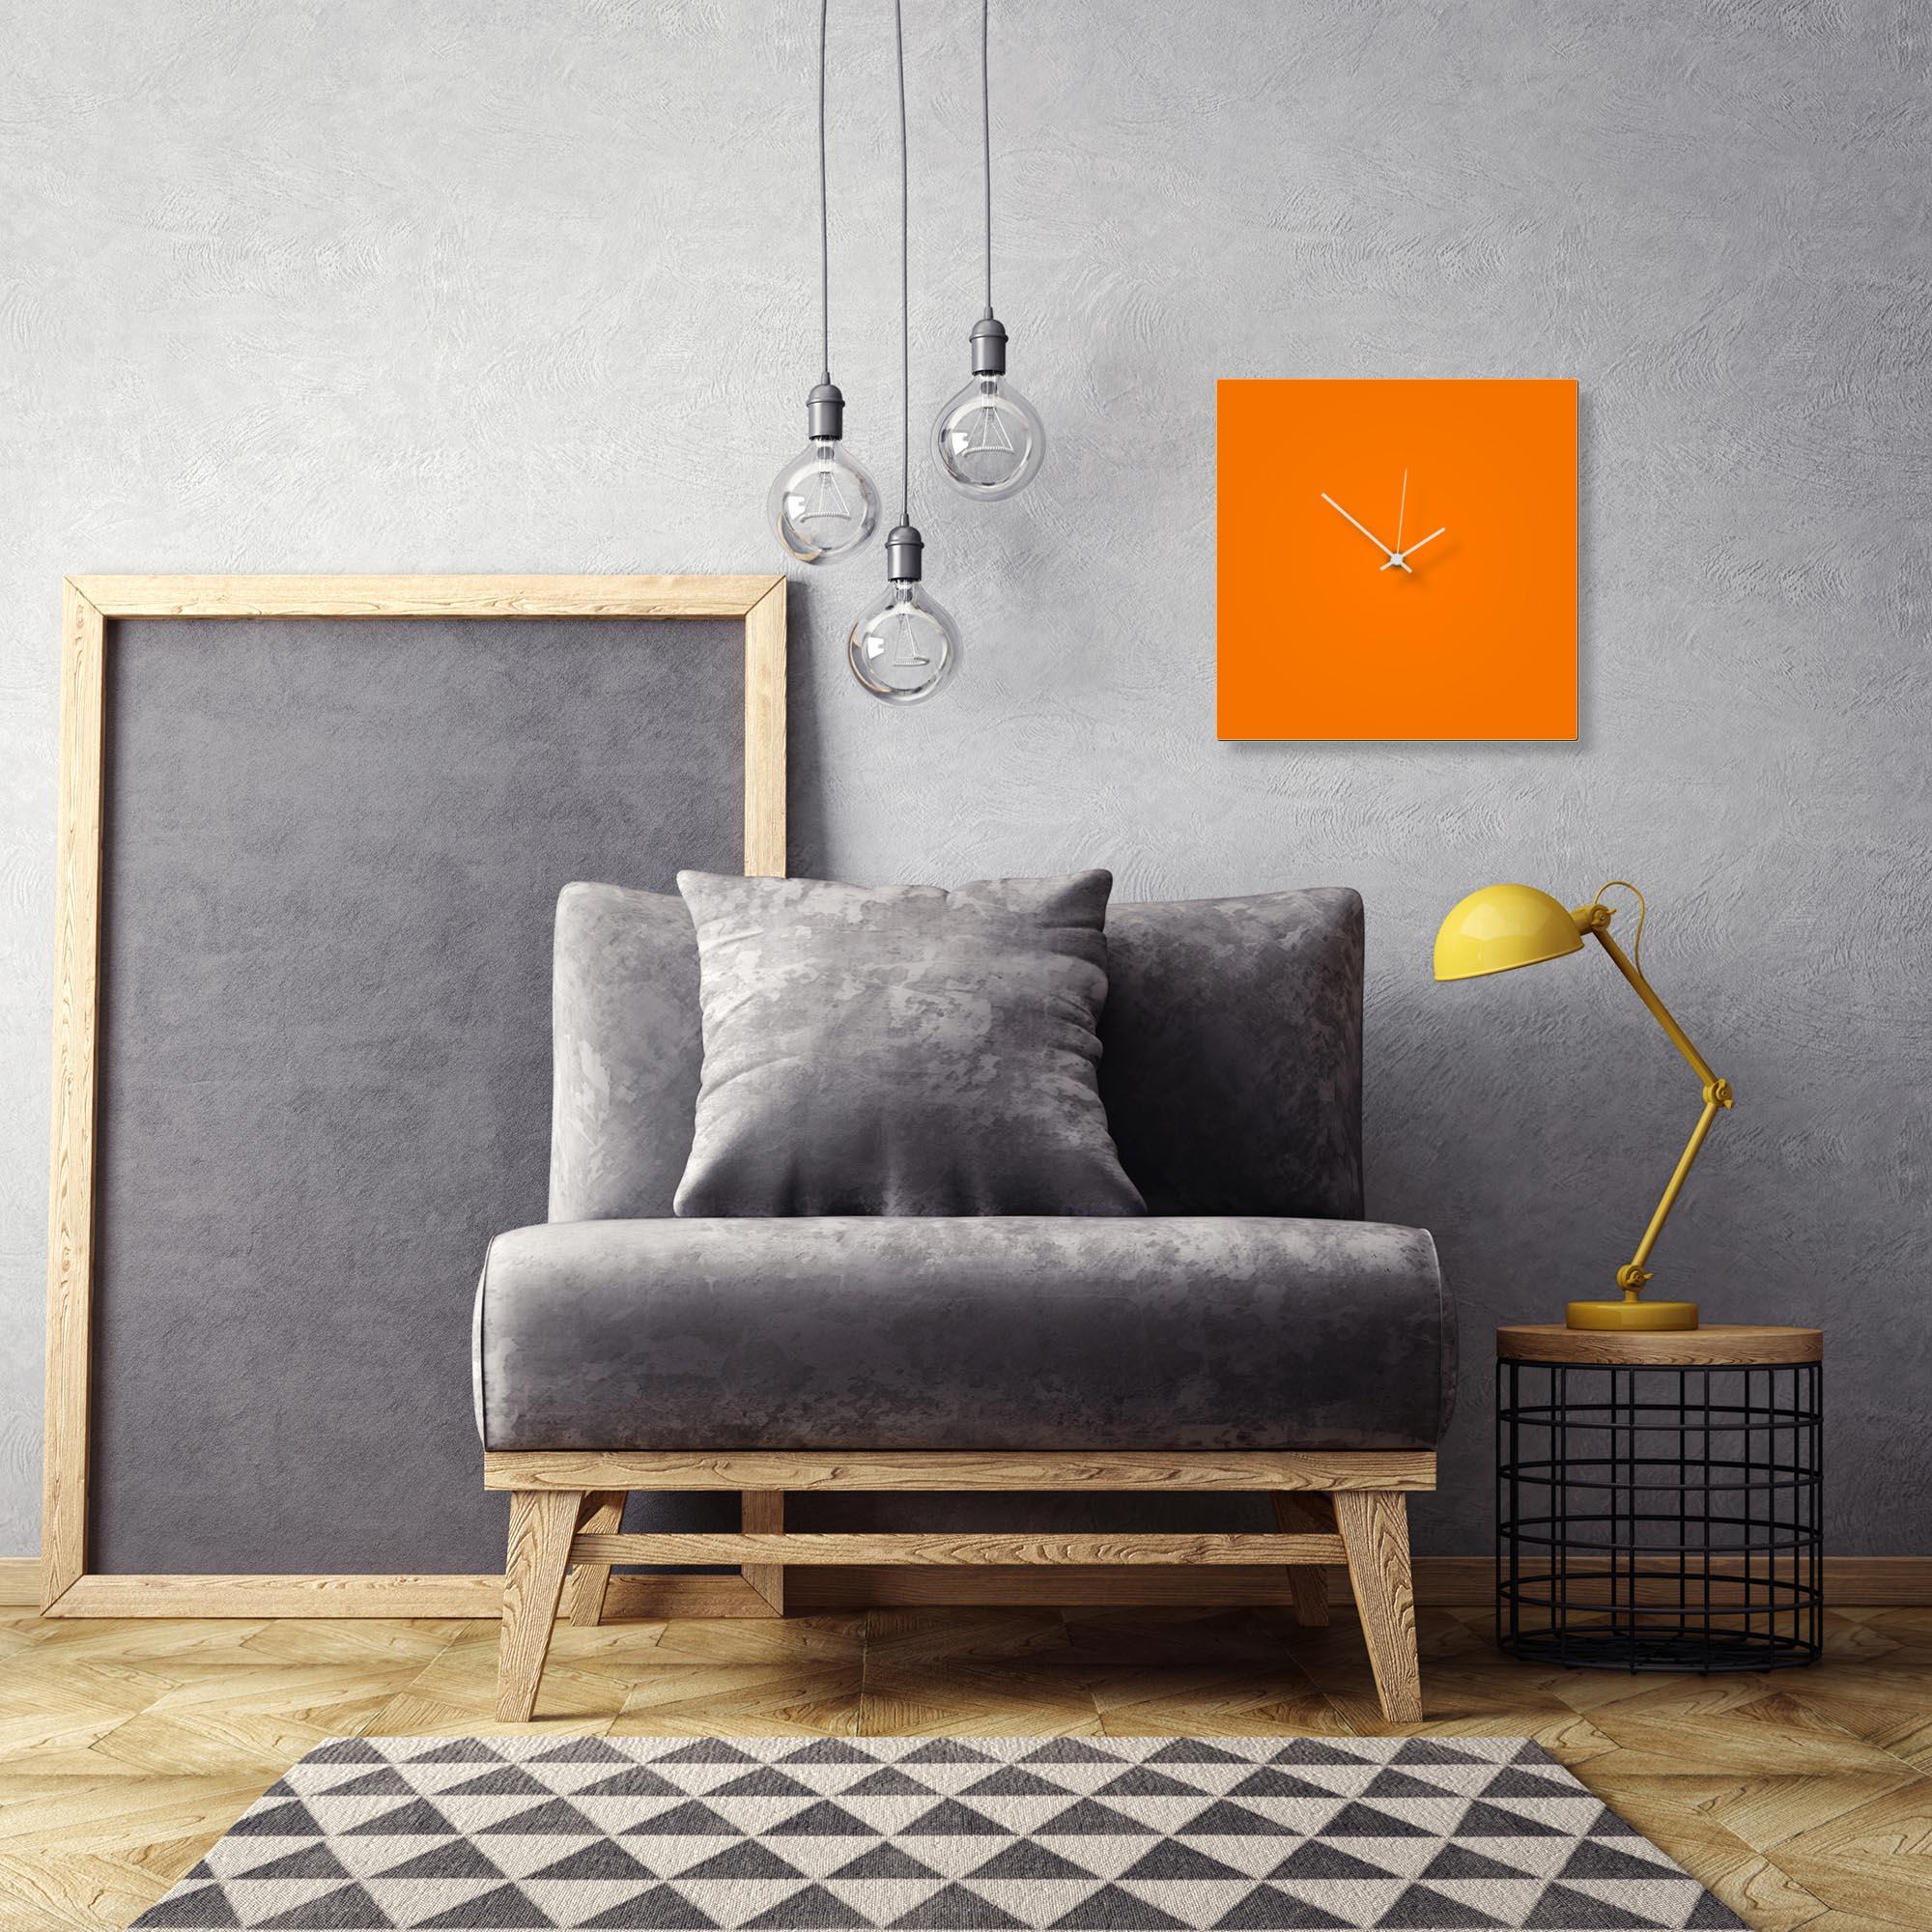 Orangeout White Square Clock by Adam Schwoeppe Contemporary Clock on Aluminum Polymetal - Alternate View 1